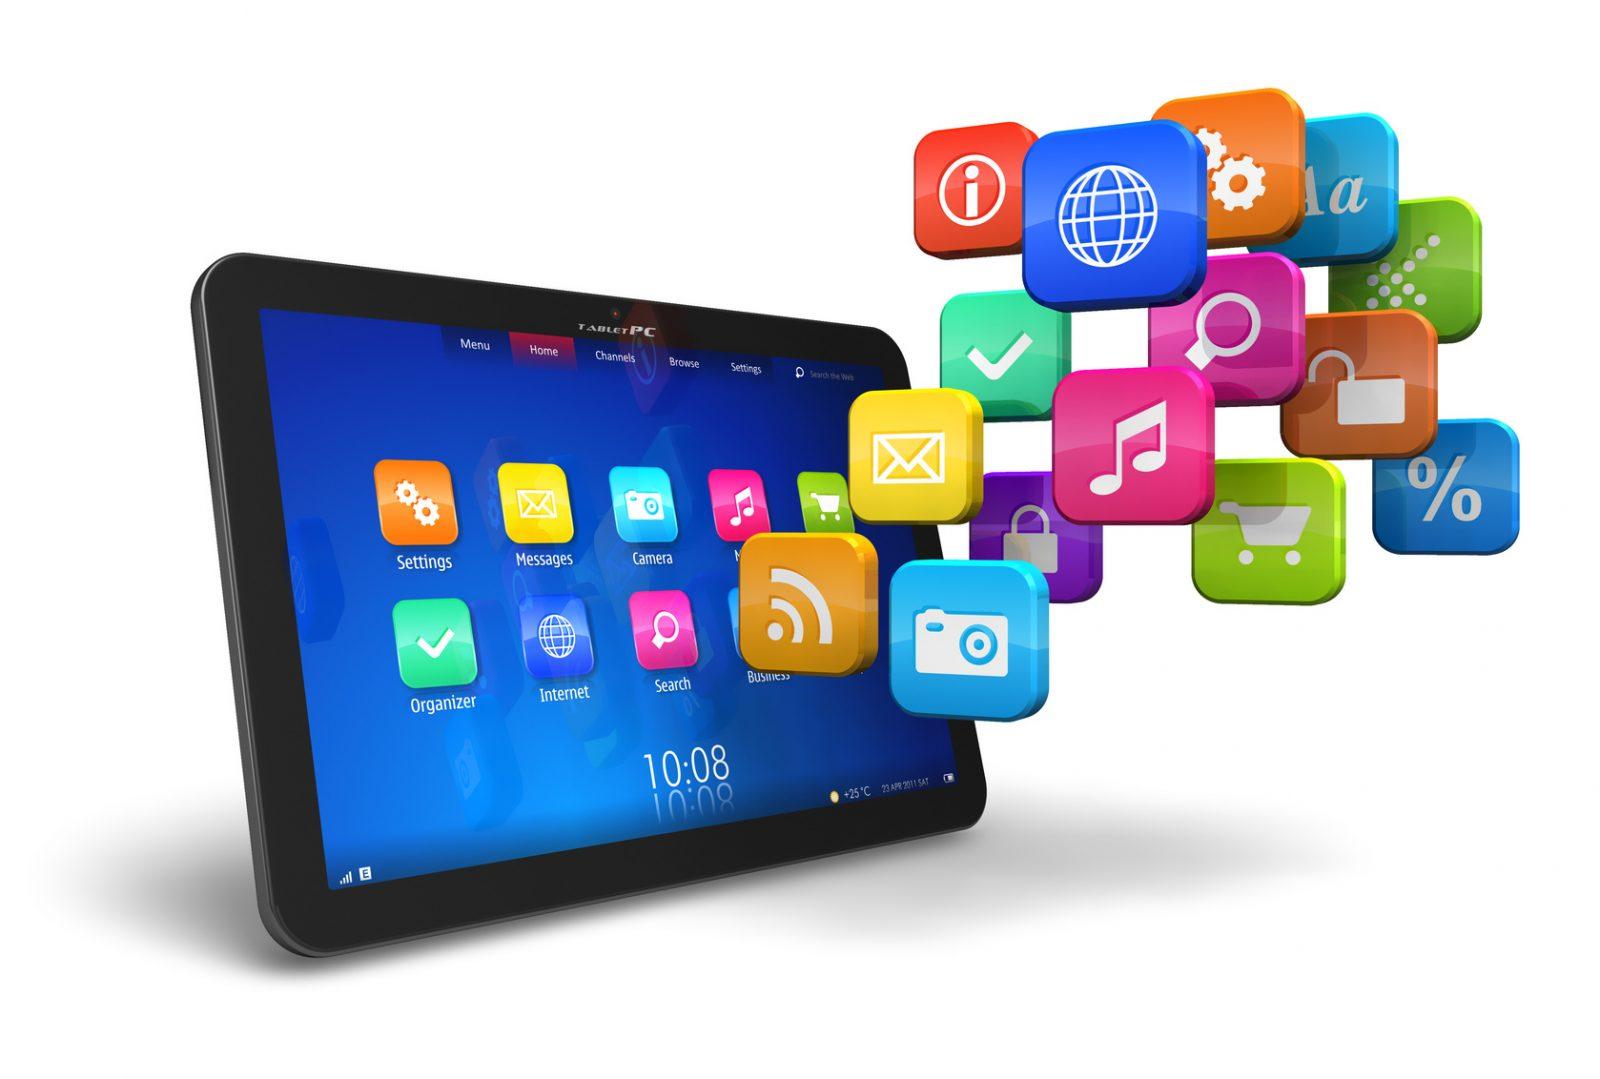 Tablet Vergleich: iPad mini vs. Nexus